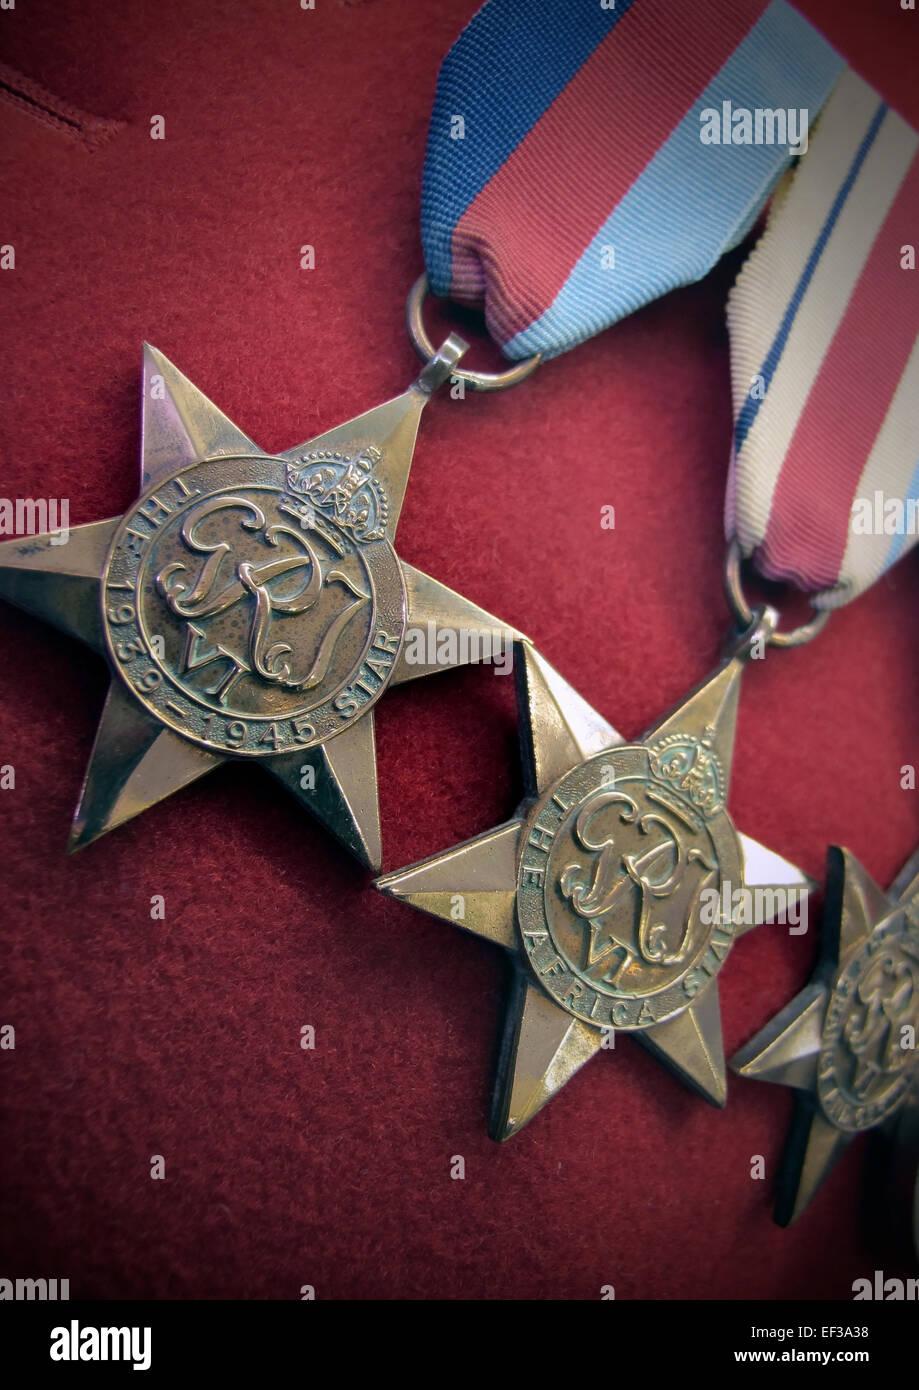 war medals - Stock Image